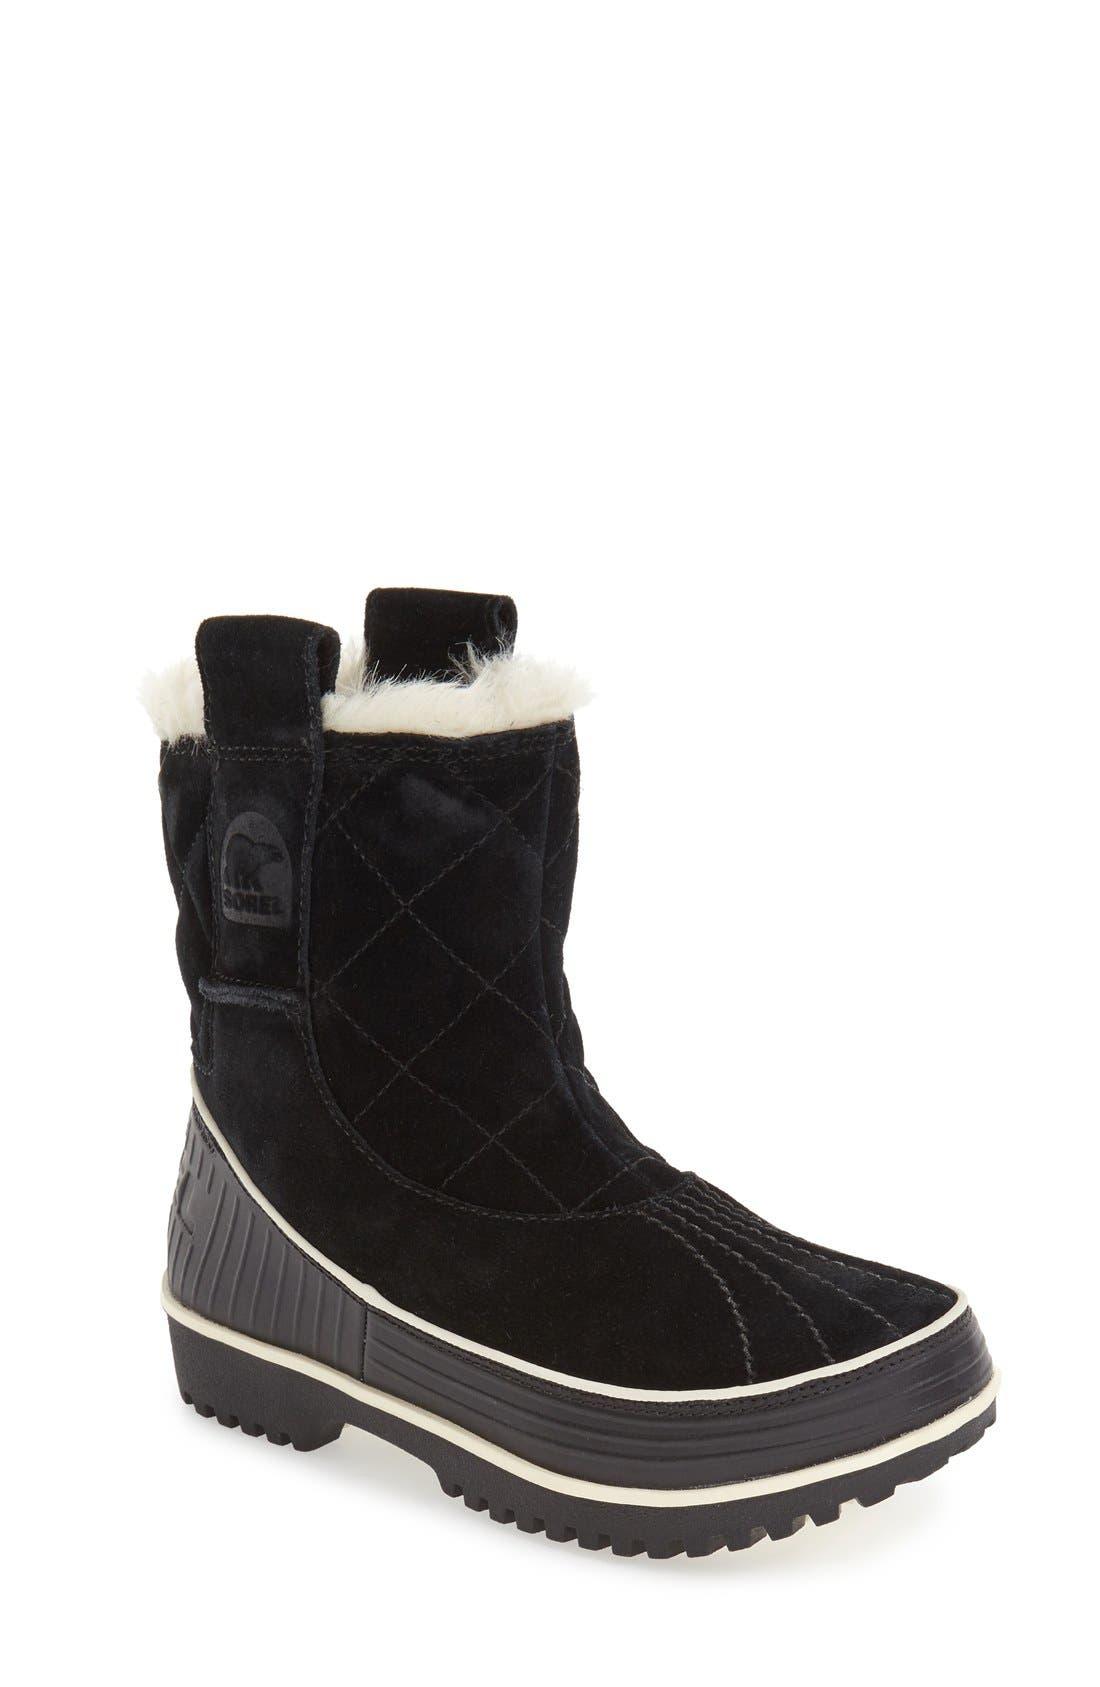 SOREL Tivoli II Waterproof Snow Boot